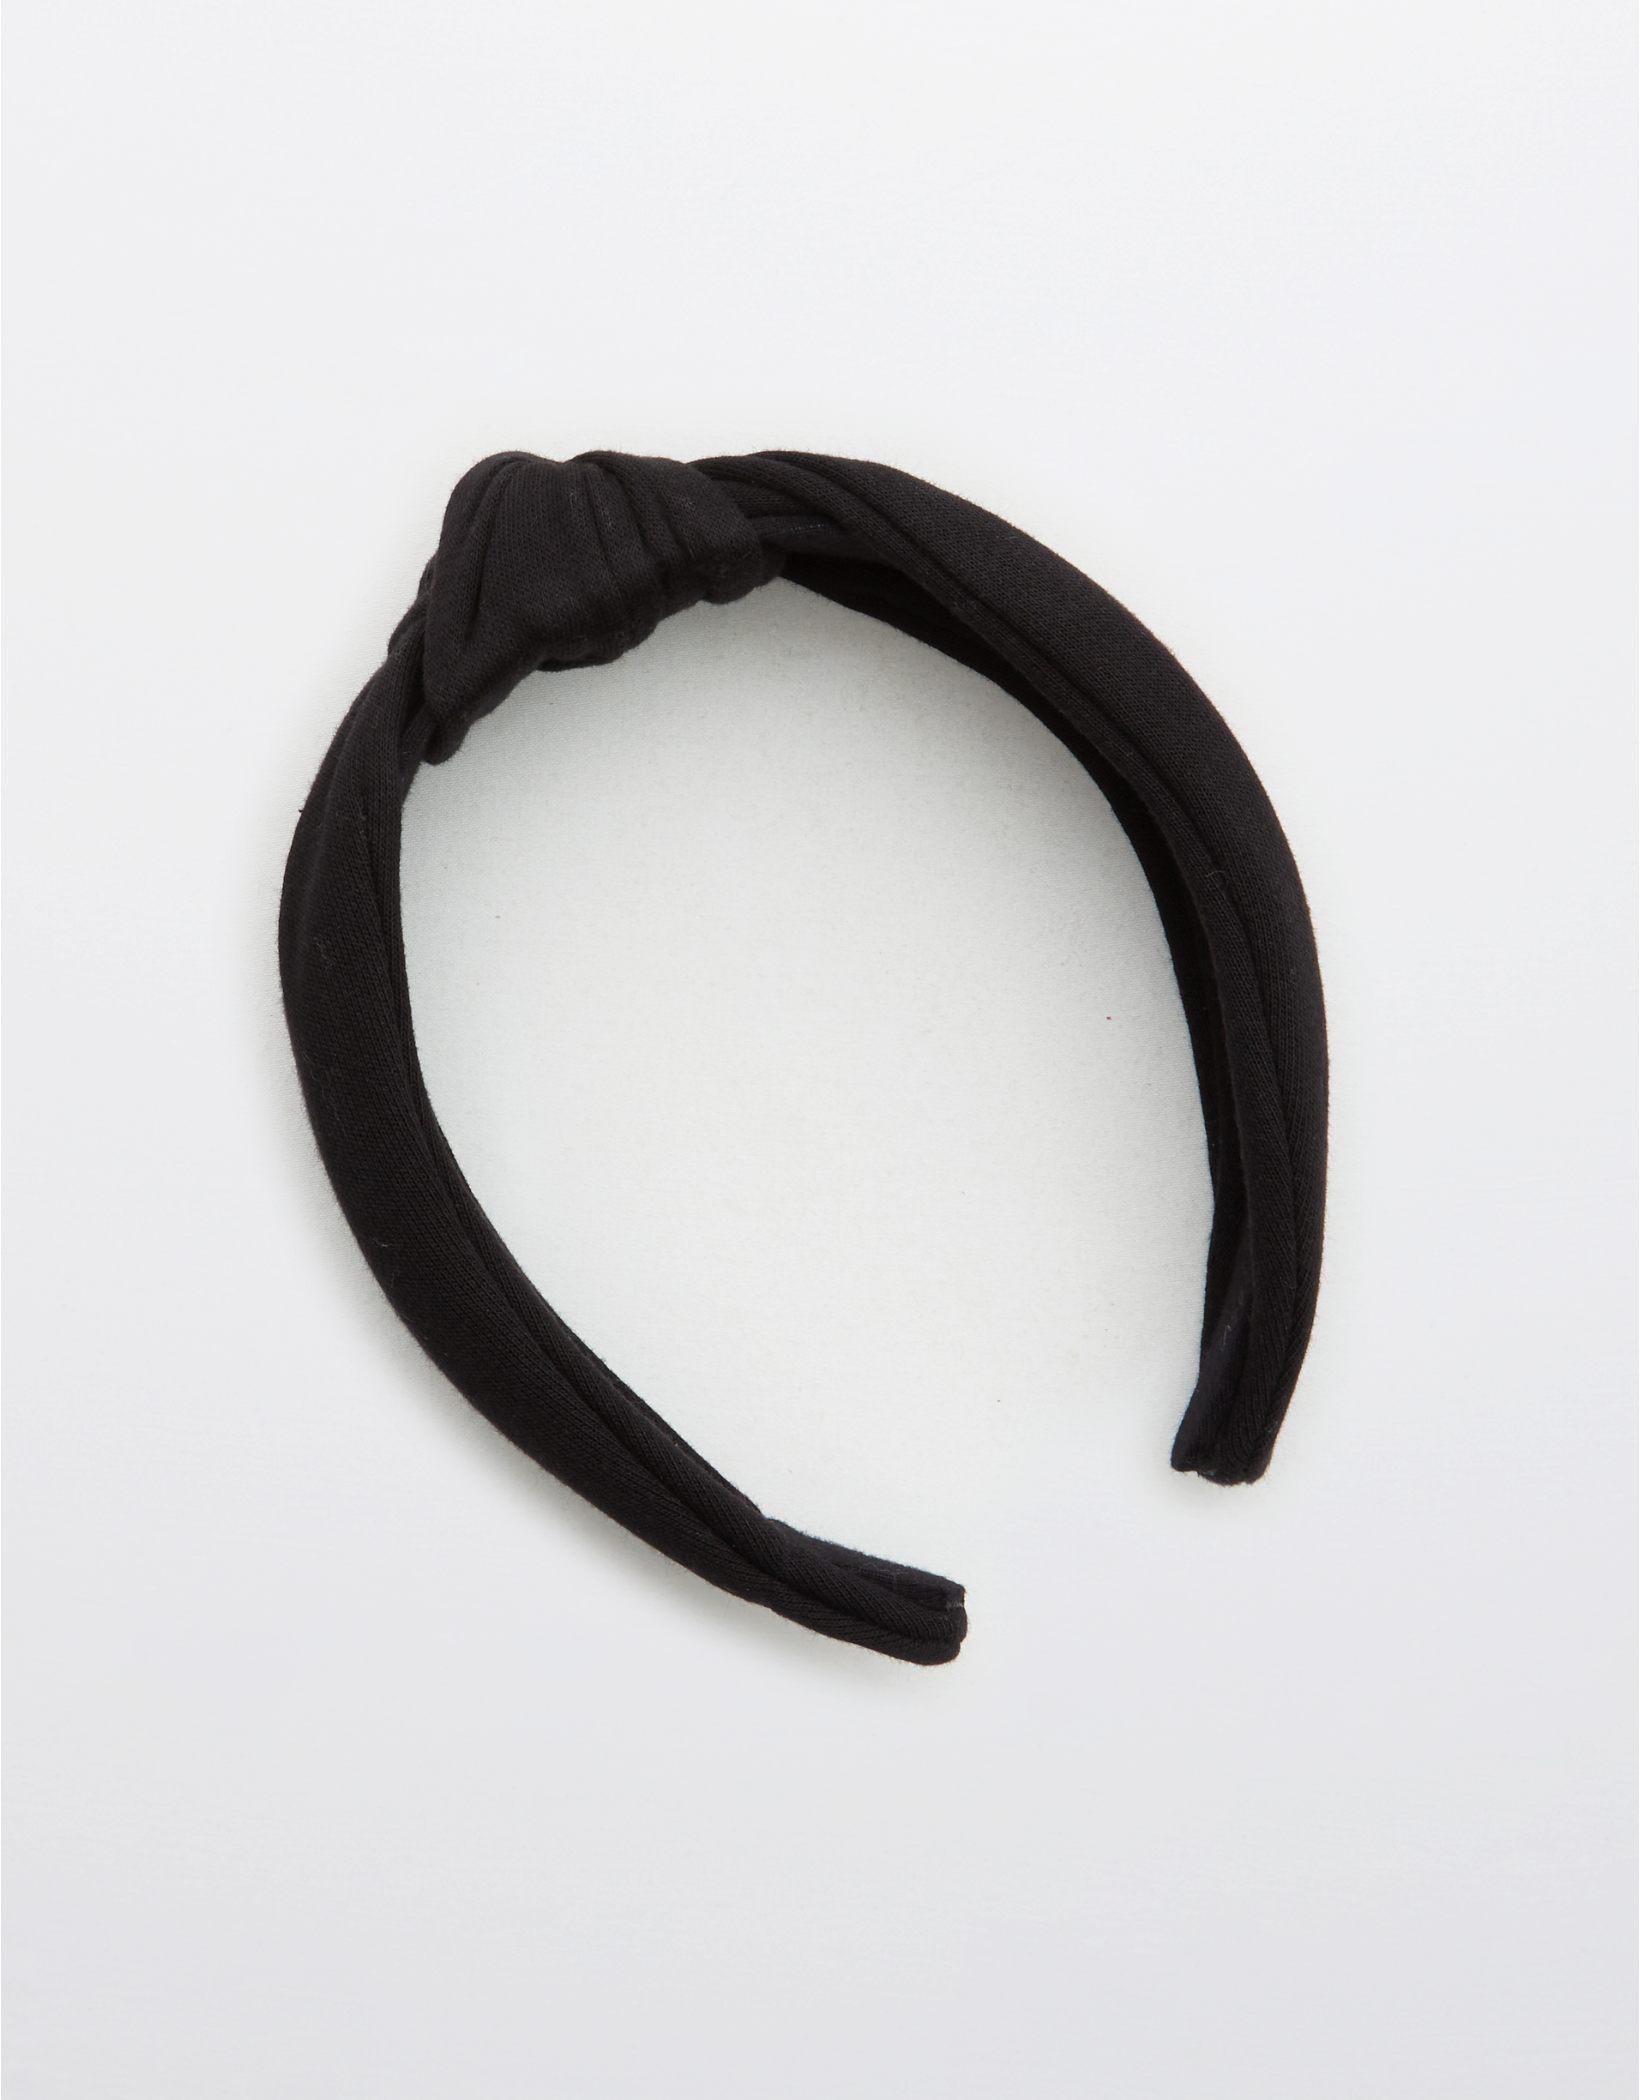 Aerie Fleece Top Knot Headband